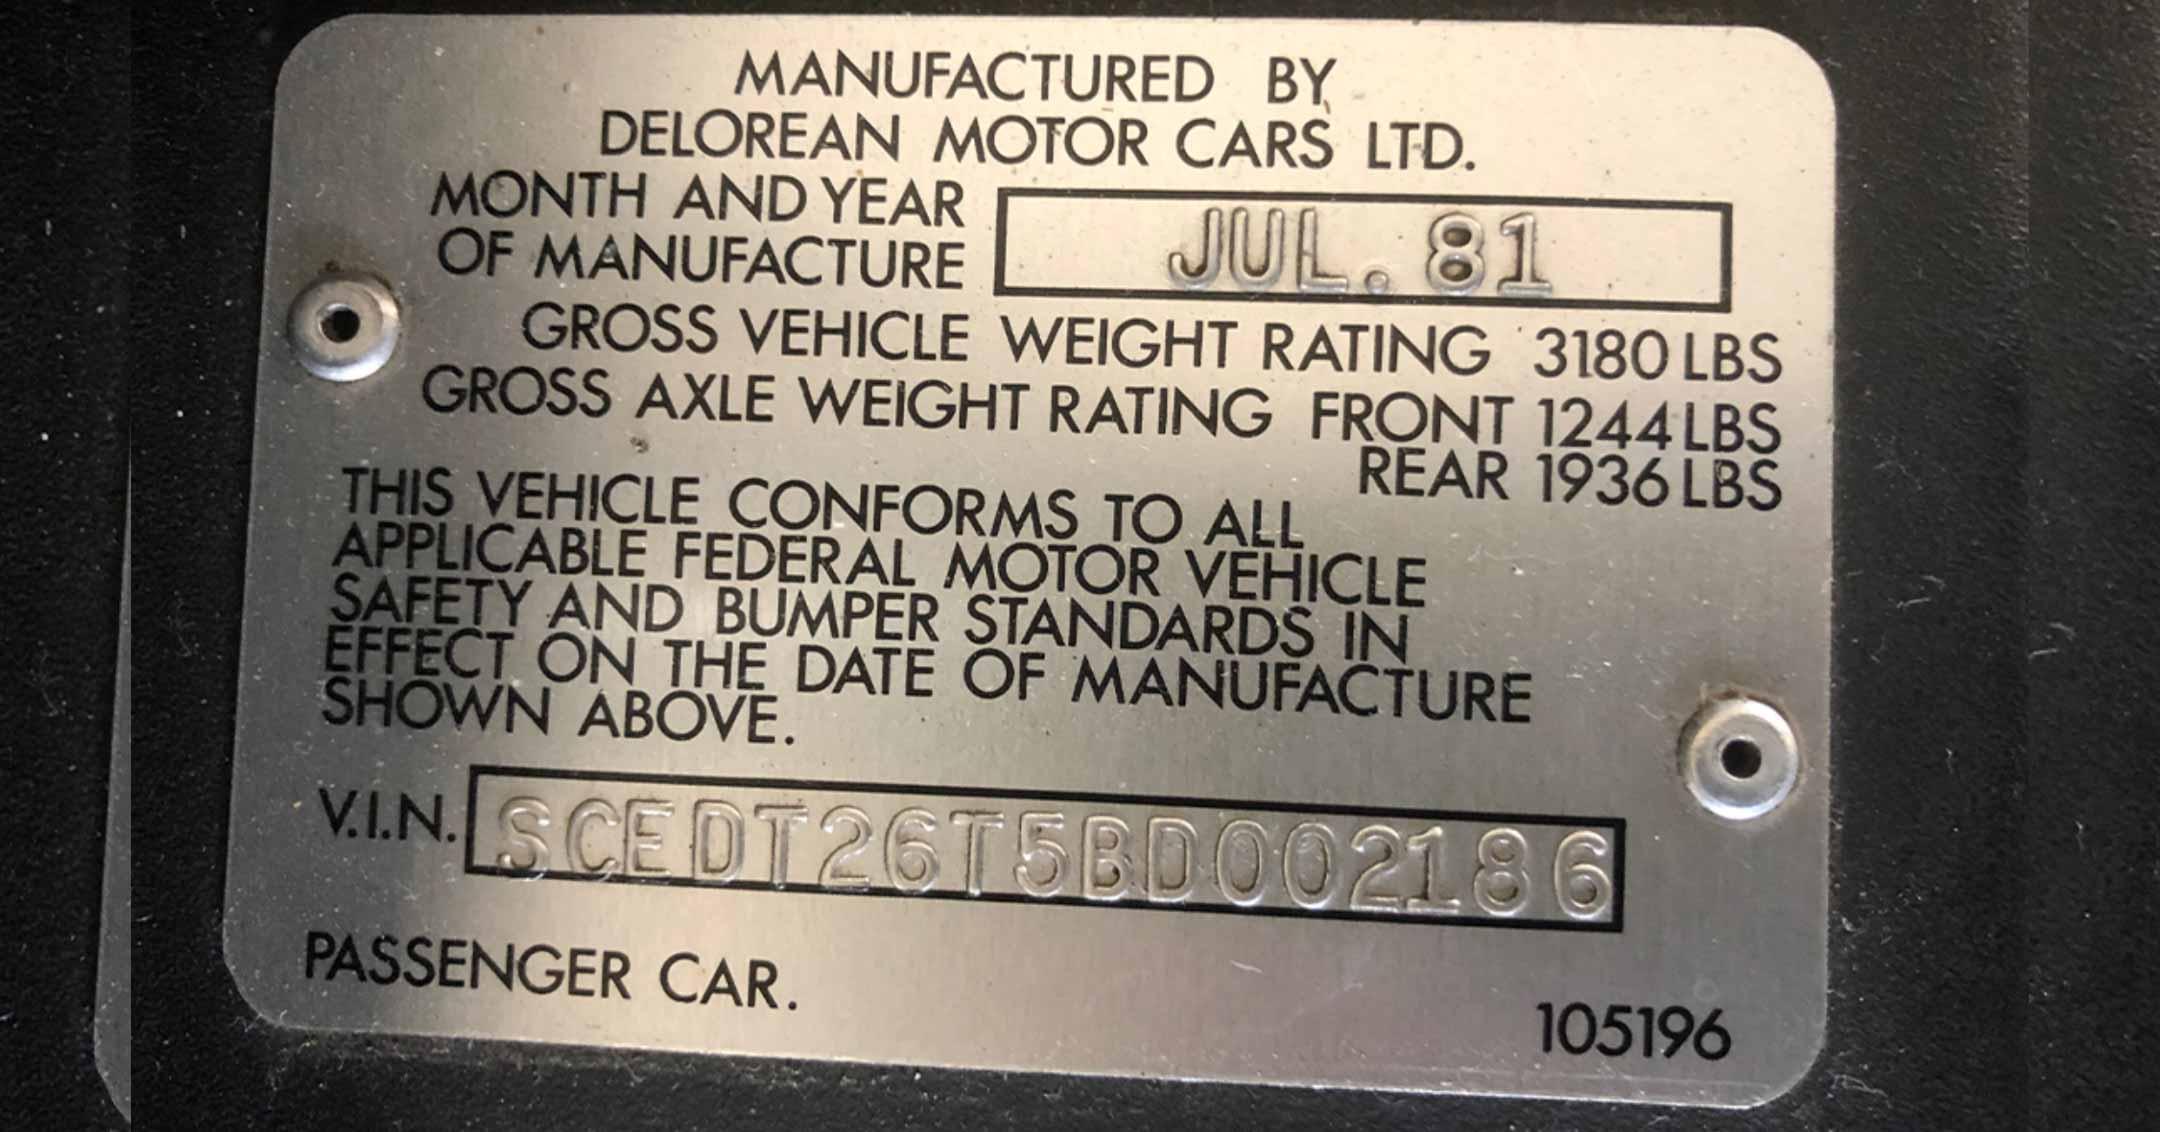 SCEDT26T5BD002186 | DeLoreanDirectory.com